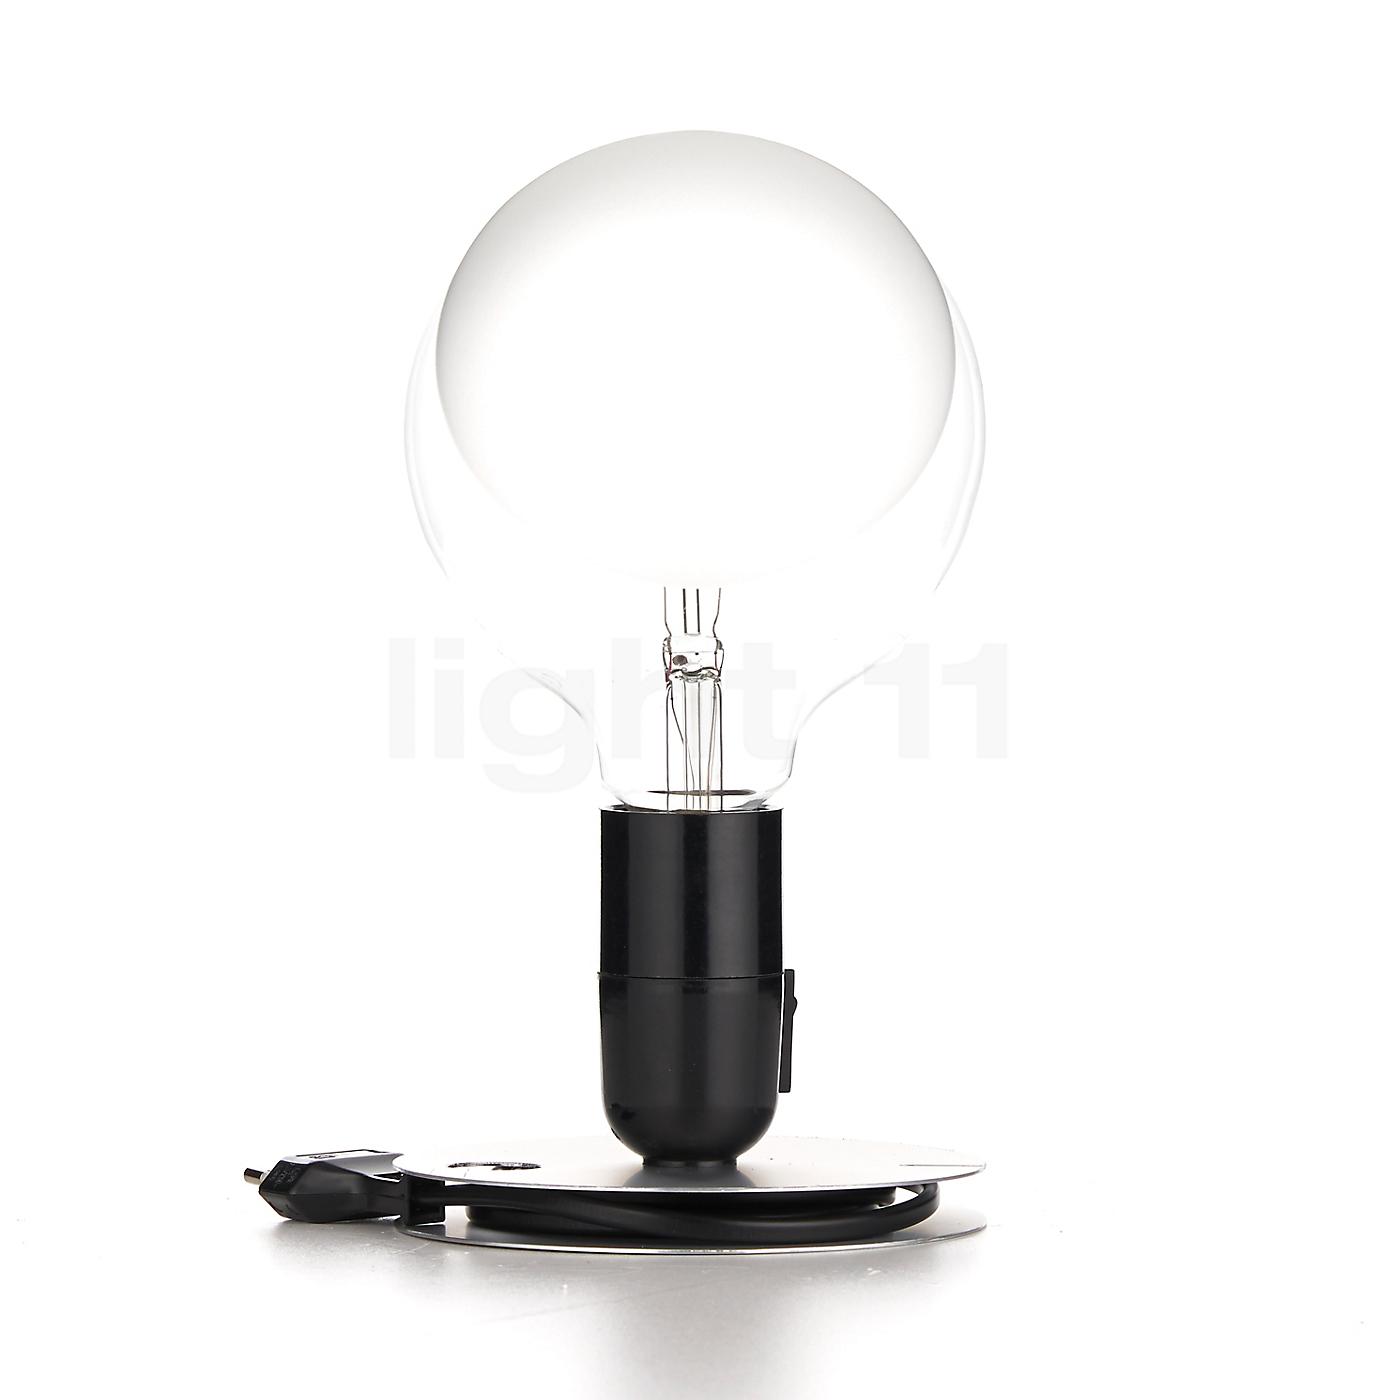 Lampade Comodino Flos: Flos moni 1 da comprare su light11.it. Images ...